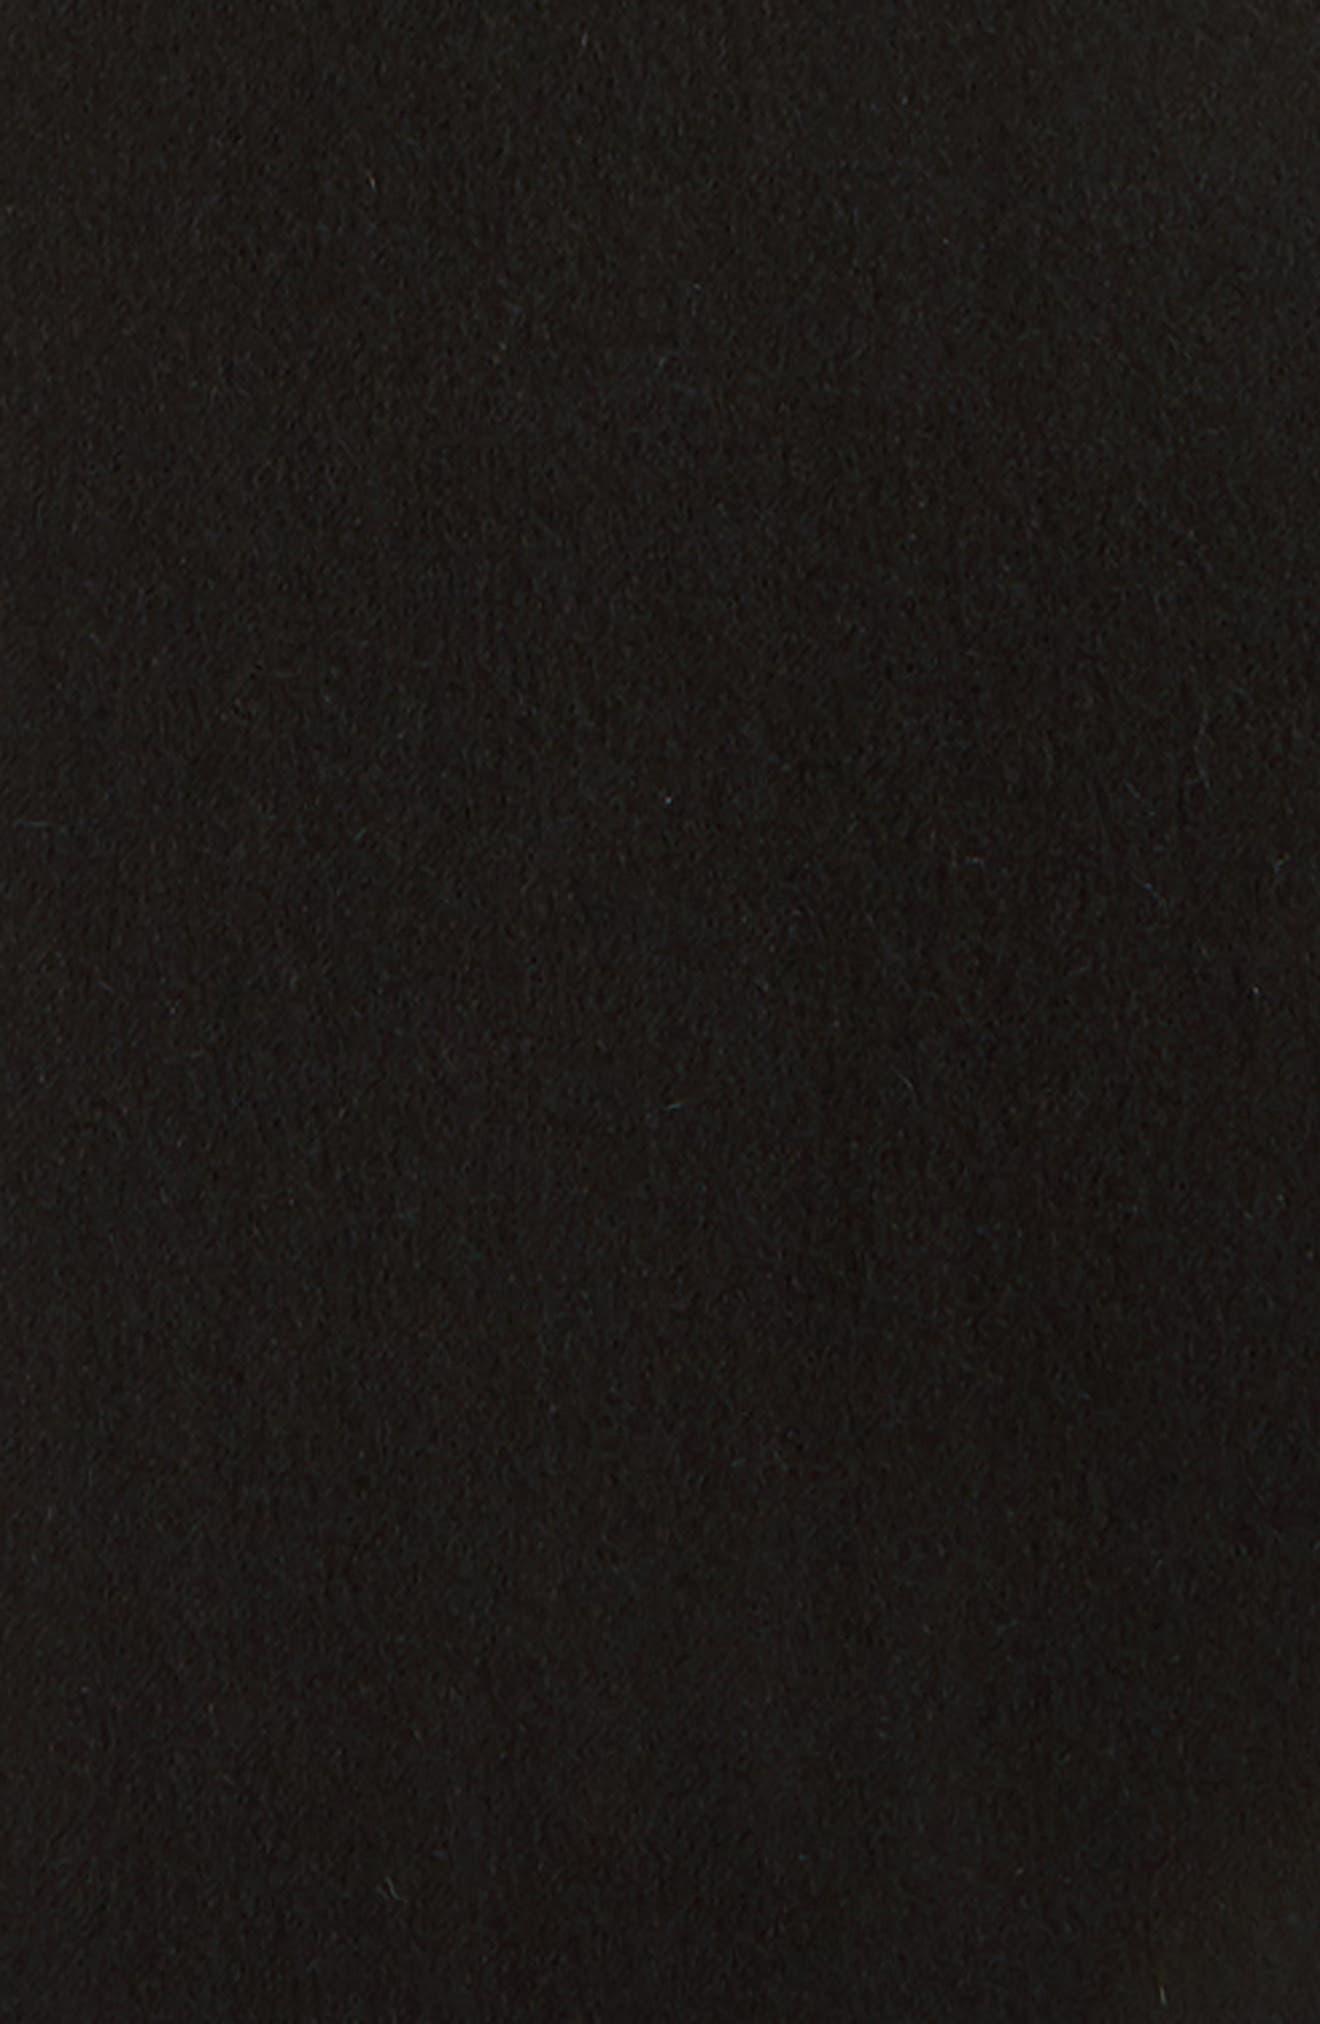 Park Alpaca Scarf,                             Alternate thumbnail 4, color,                             Black